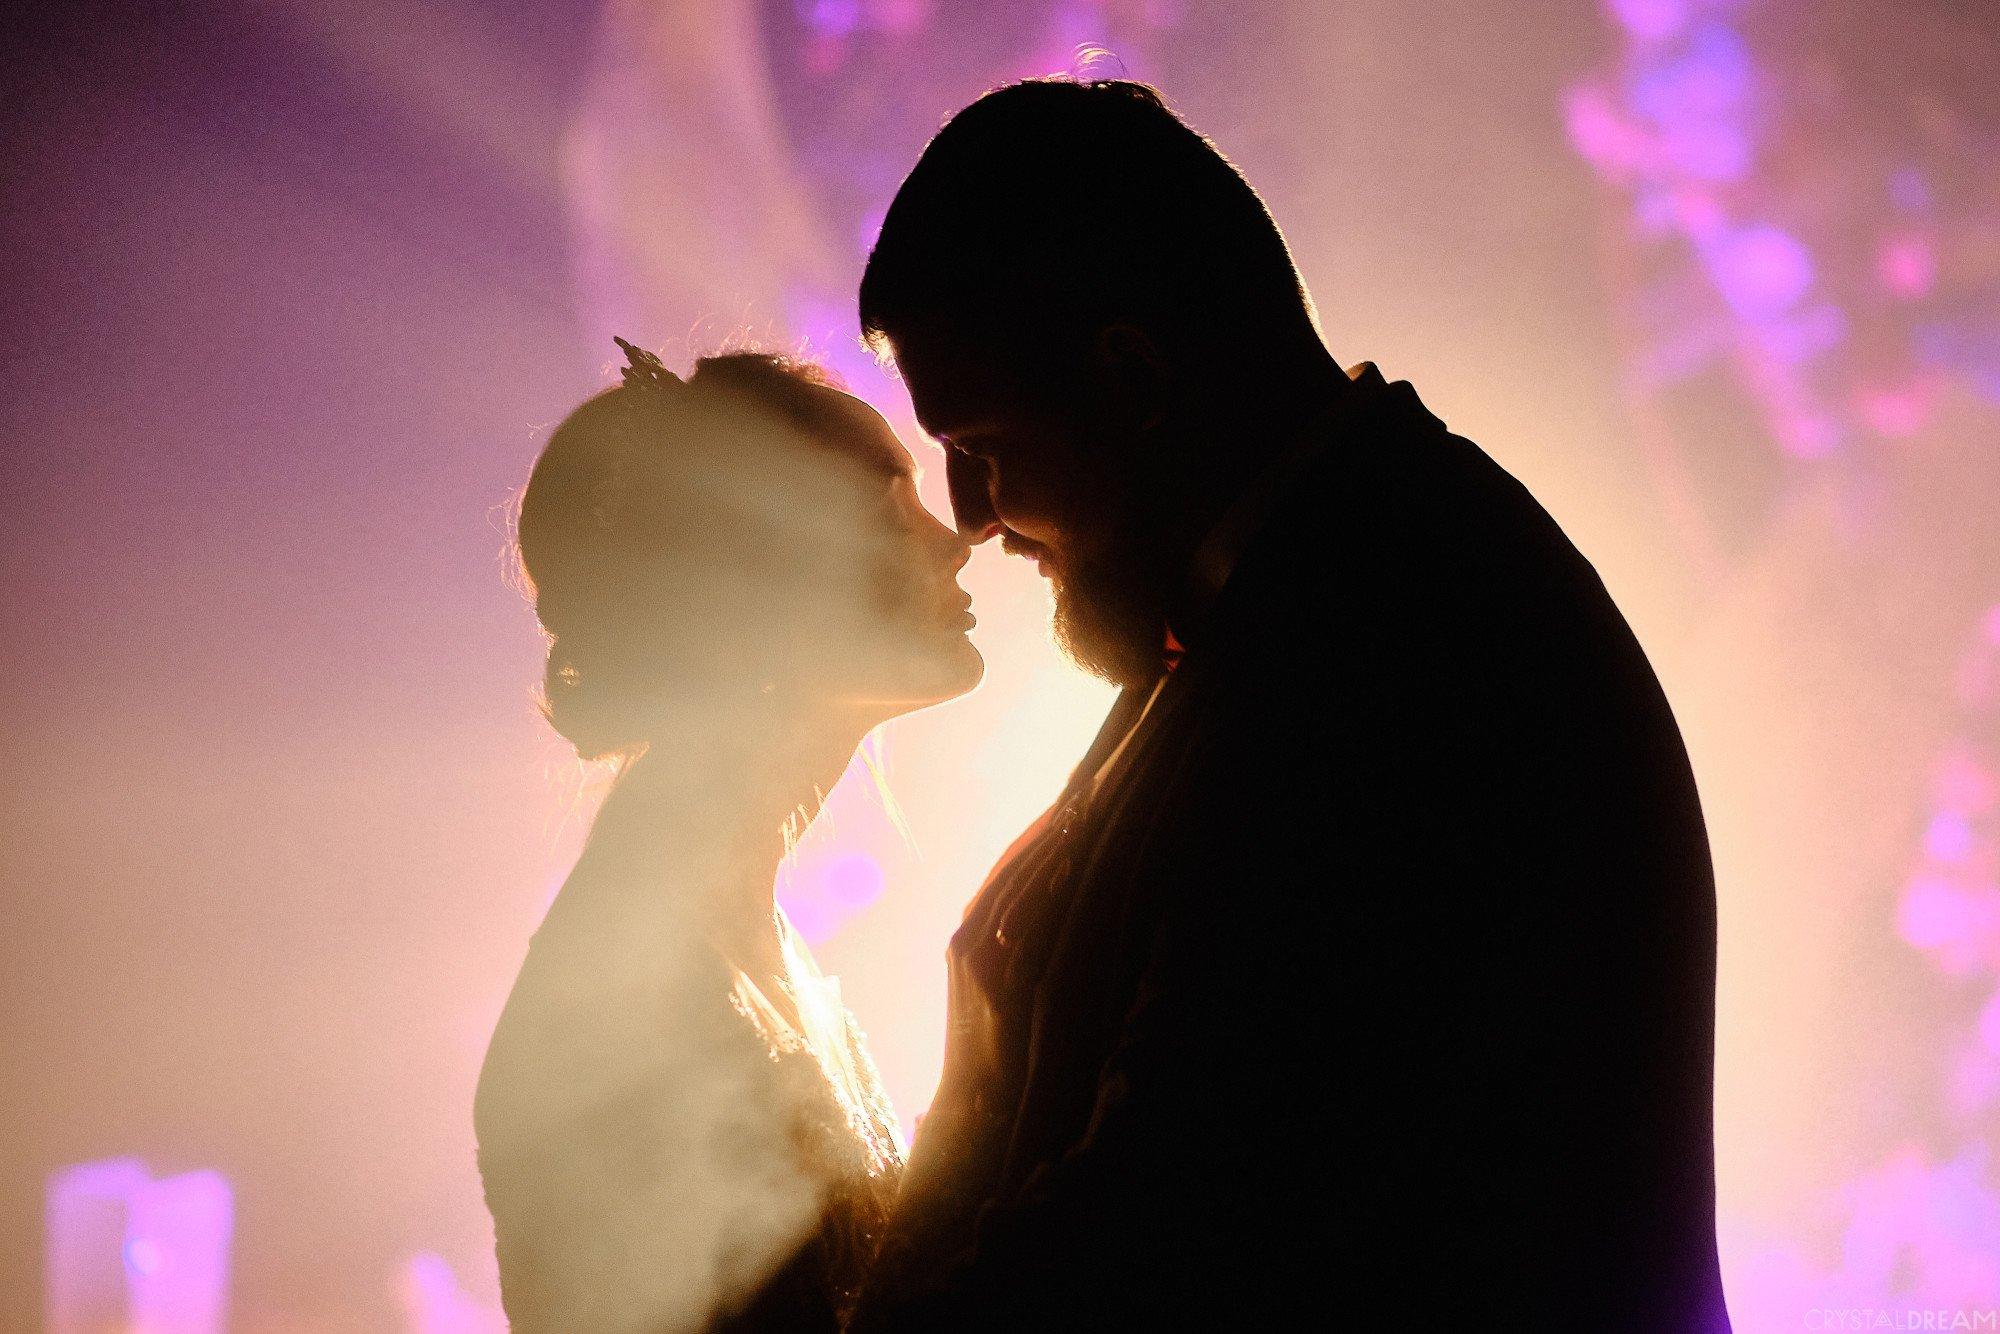 Свадьба 29 августа 2020 602